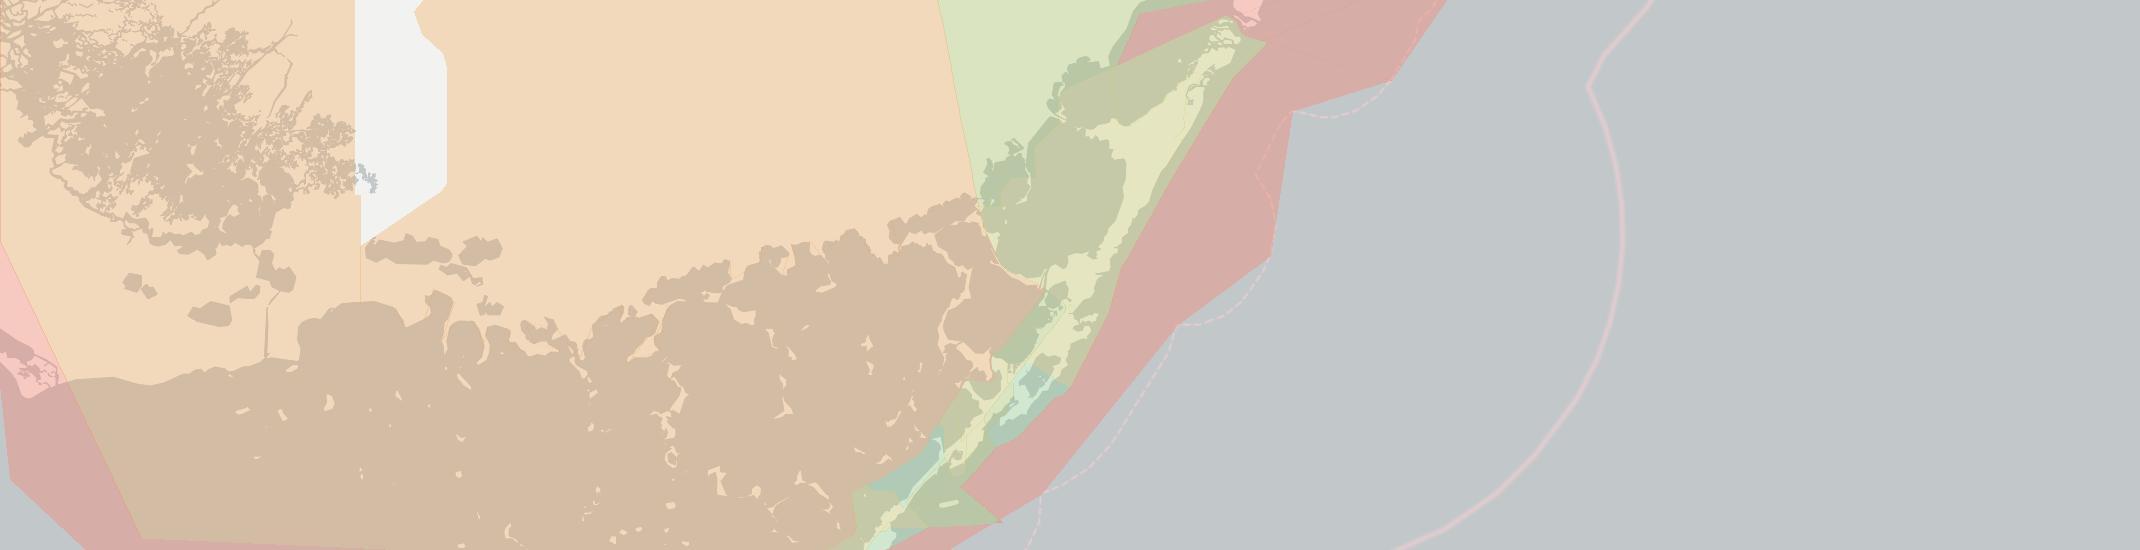 Key Largo Florida Map.Internet Providers In Key Largo Compare 12 Providers